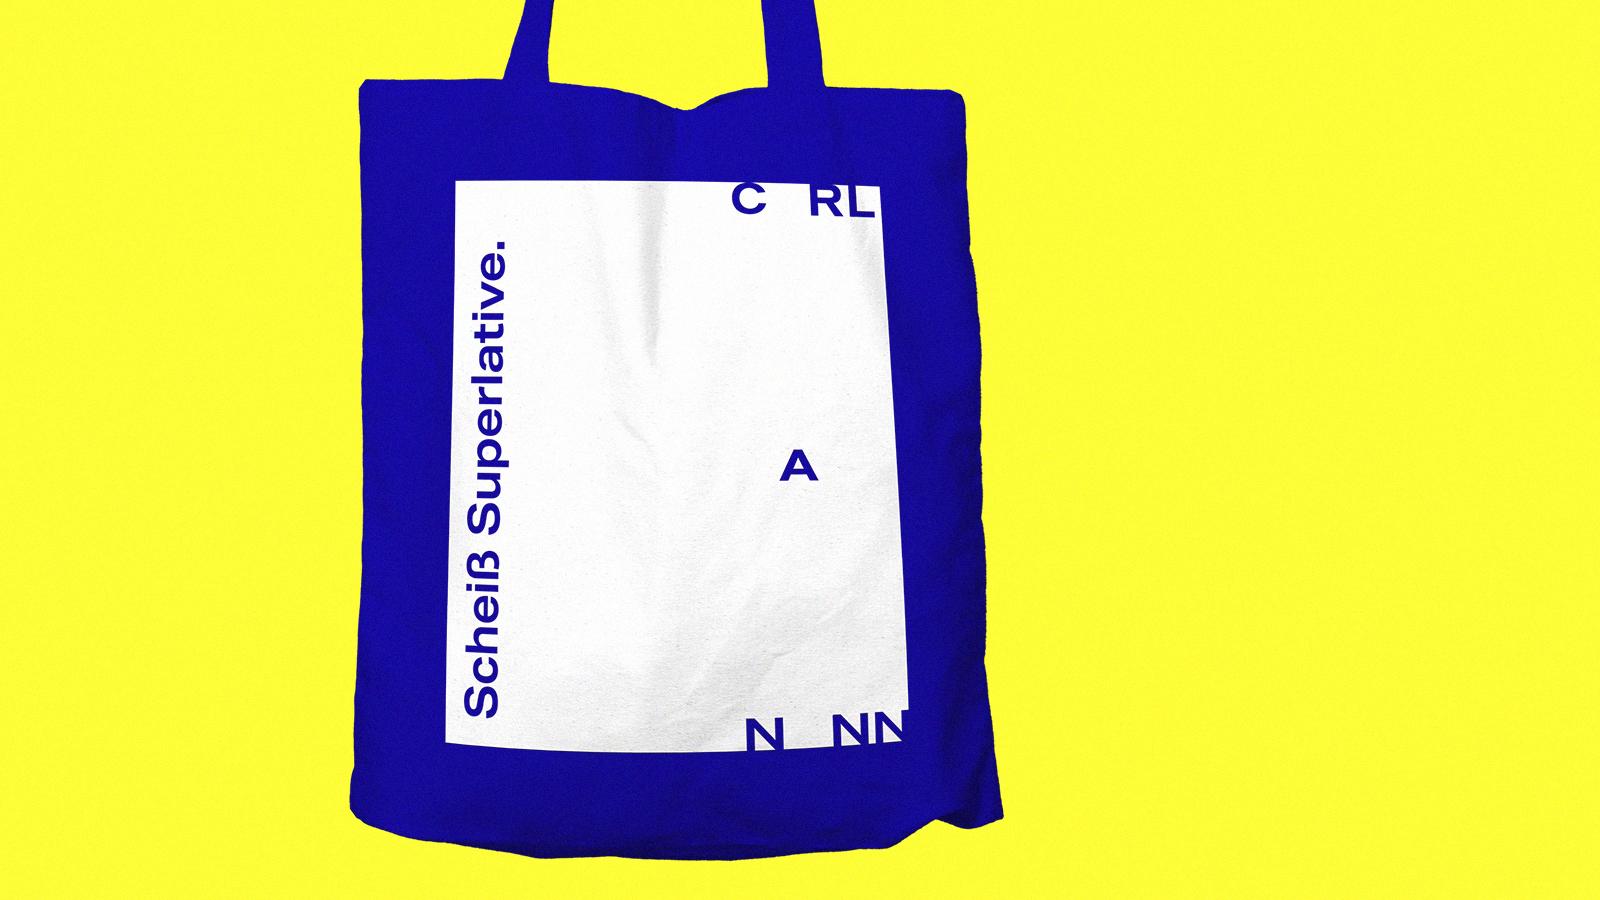 blue CarlNann Jute bag on blue background